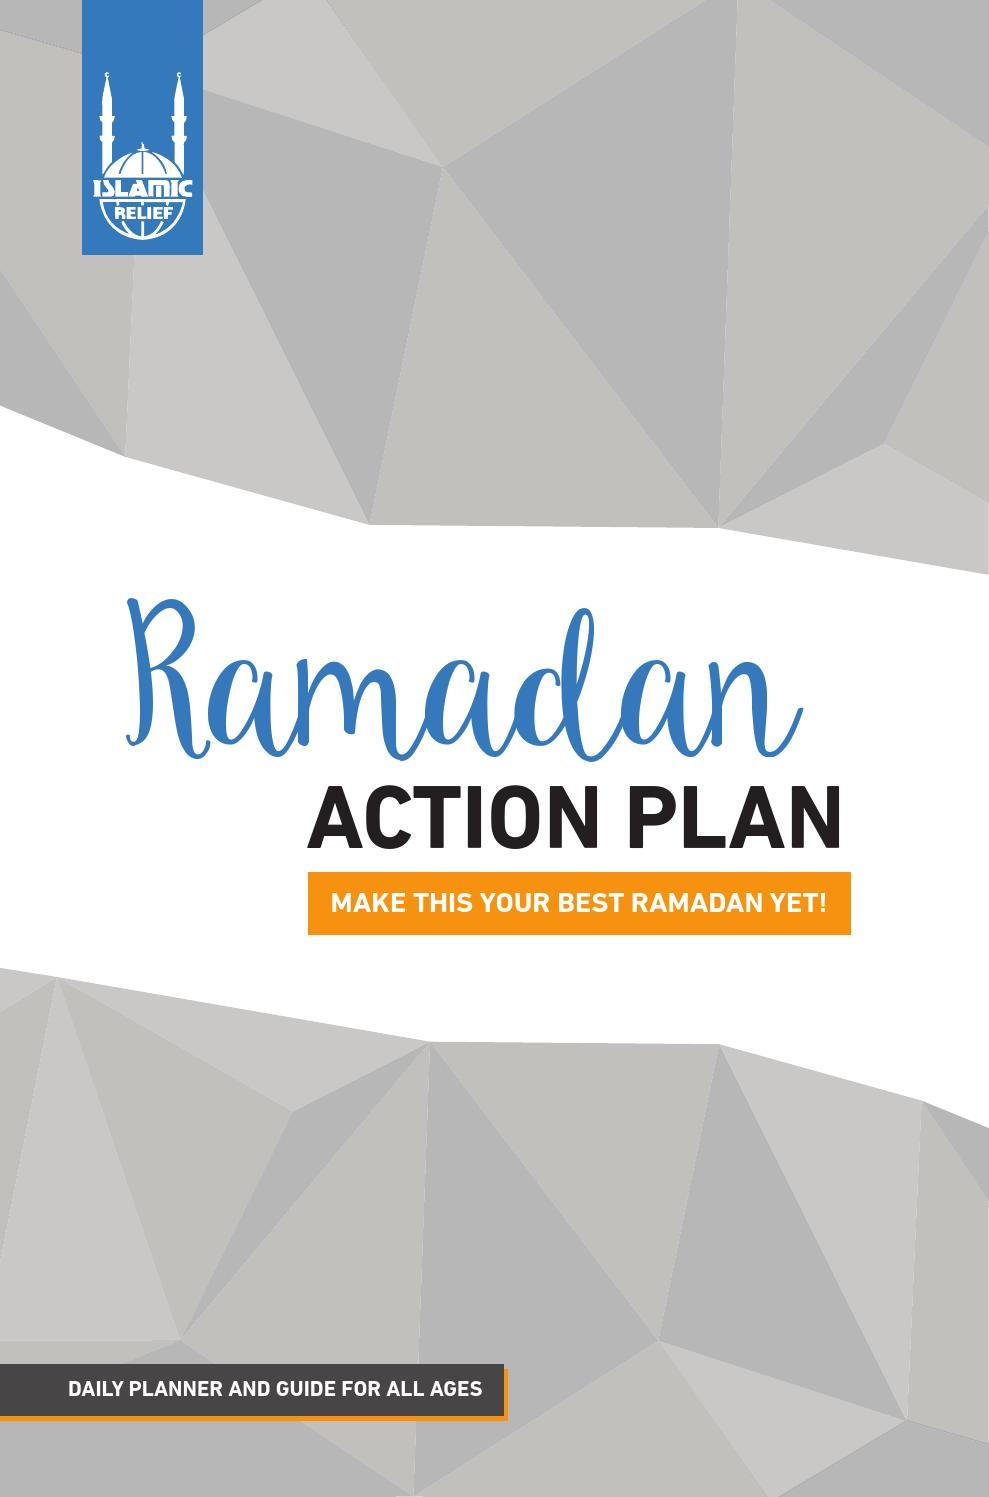 Ramadan Action Plan by Islamic Relief Canada - issuu